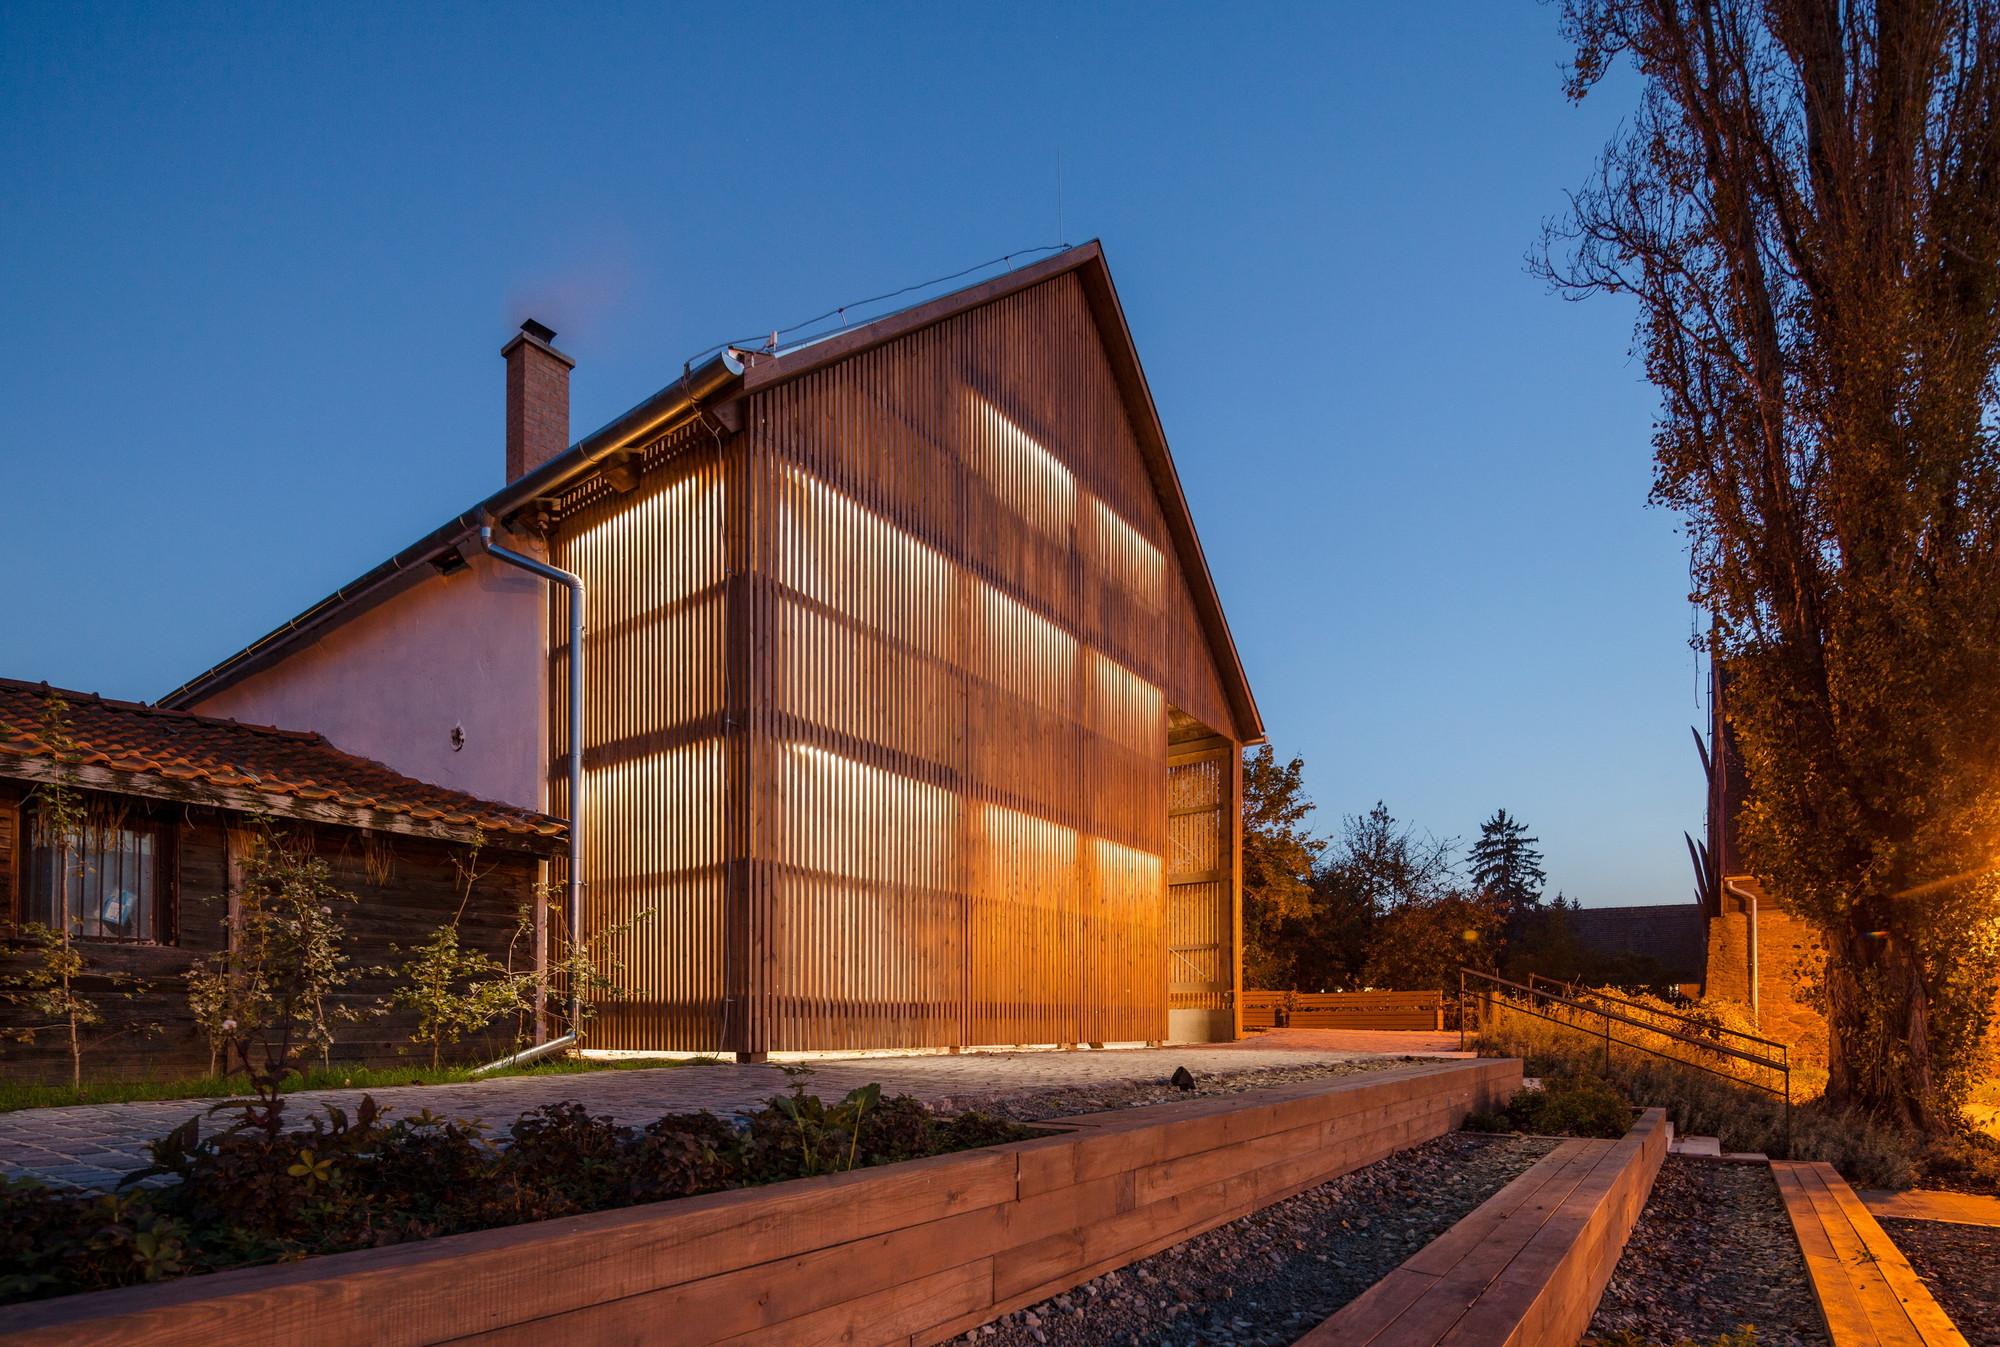 Visegad Town Center / aplusarchitects + S73 stúdió, © The Greypixel Workshop